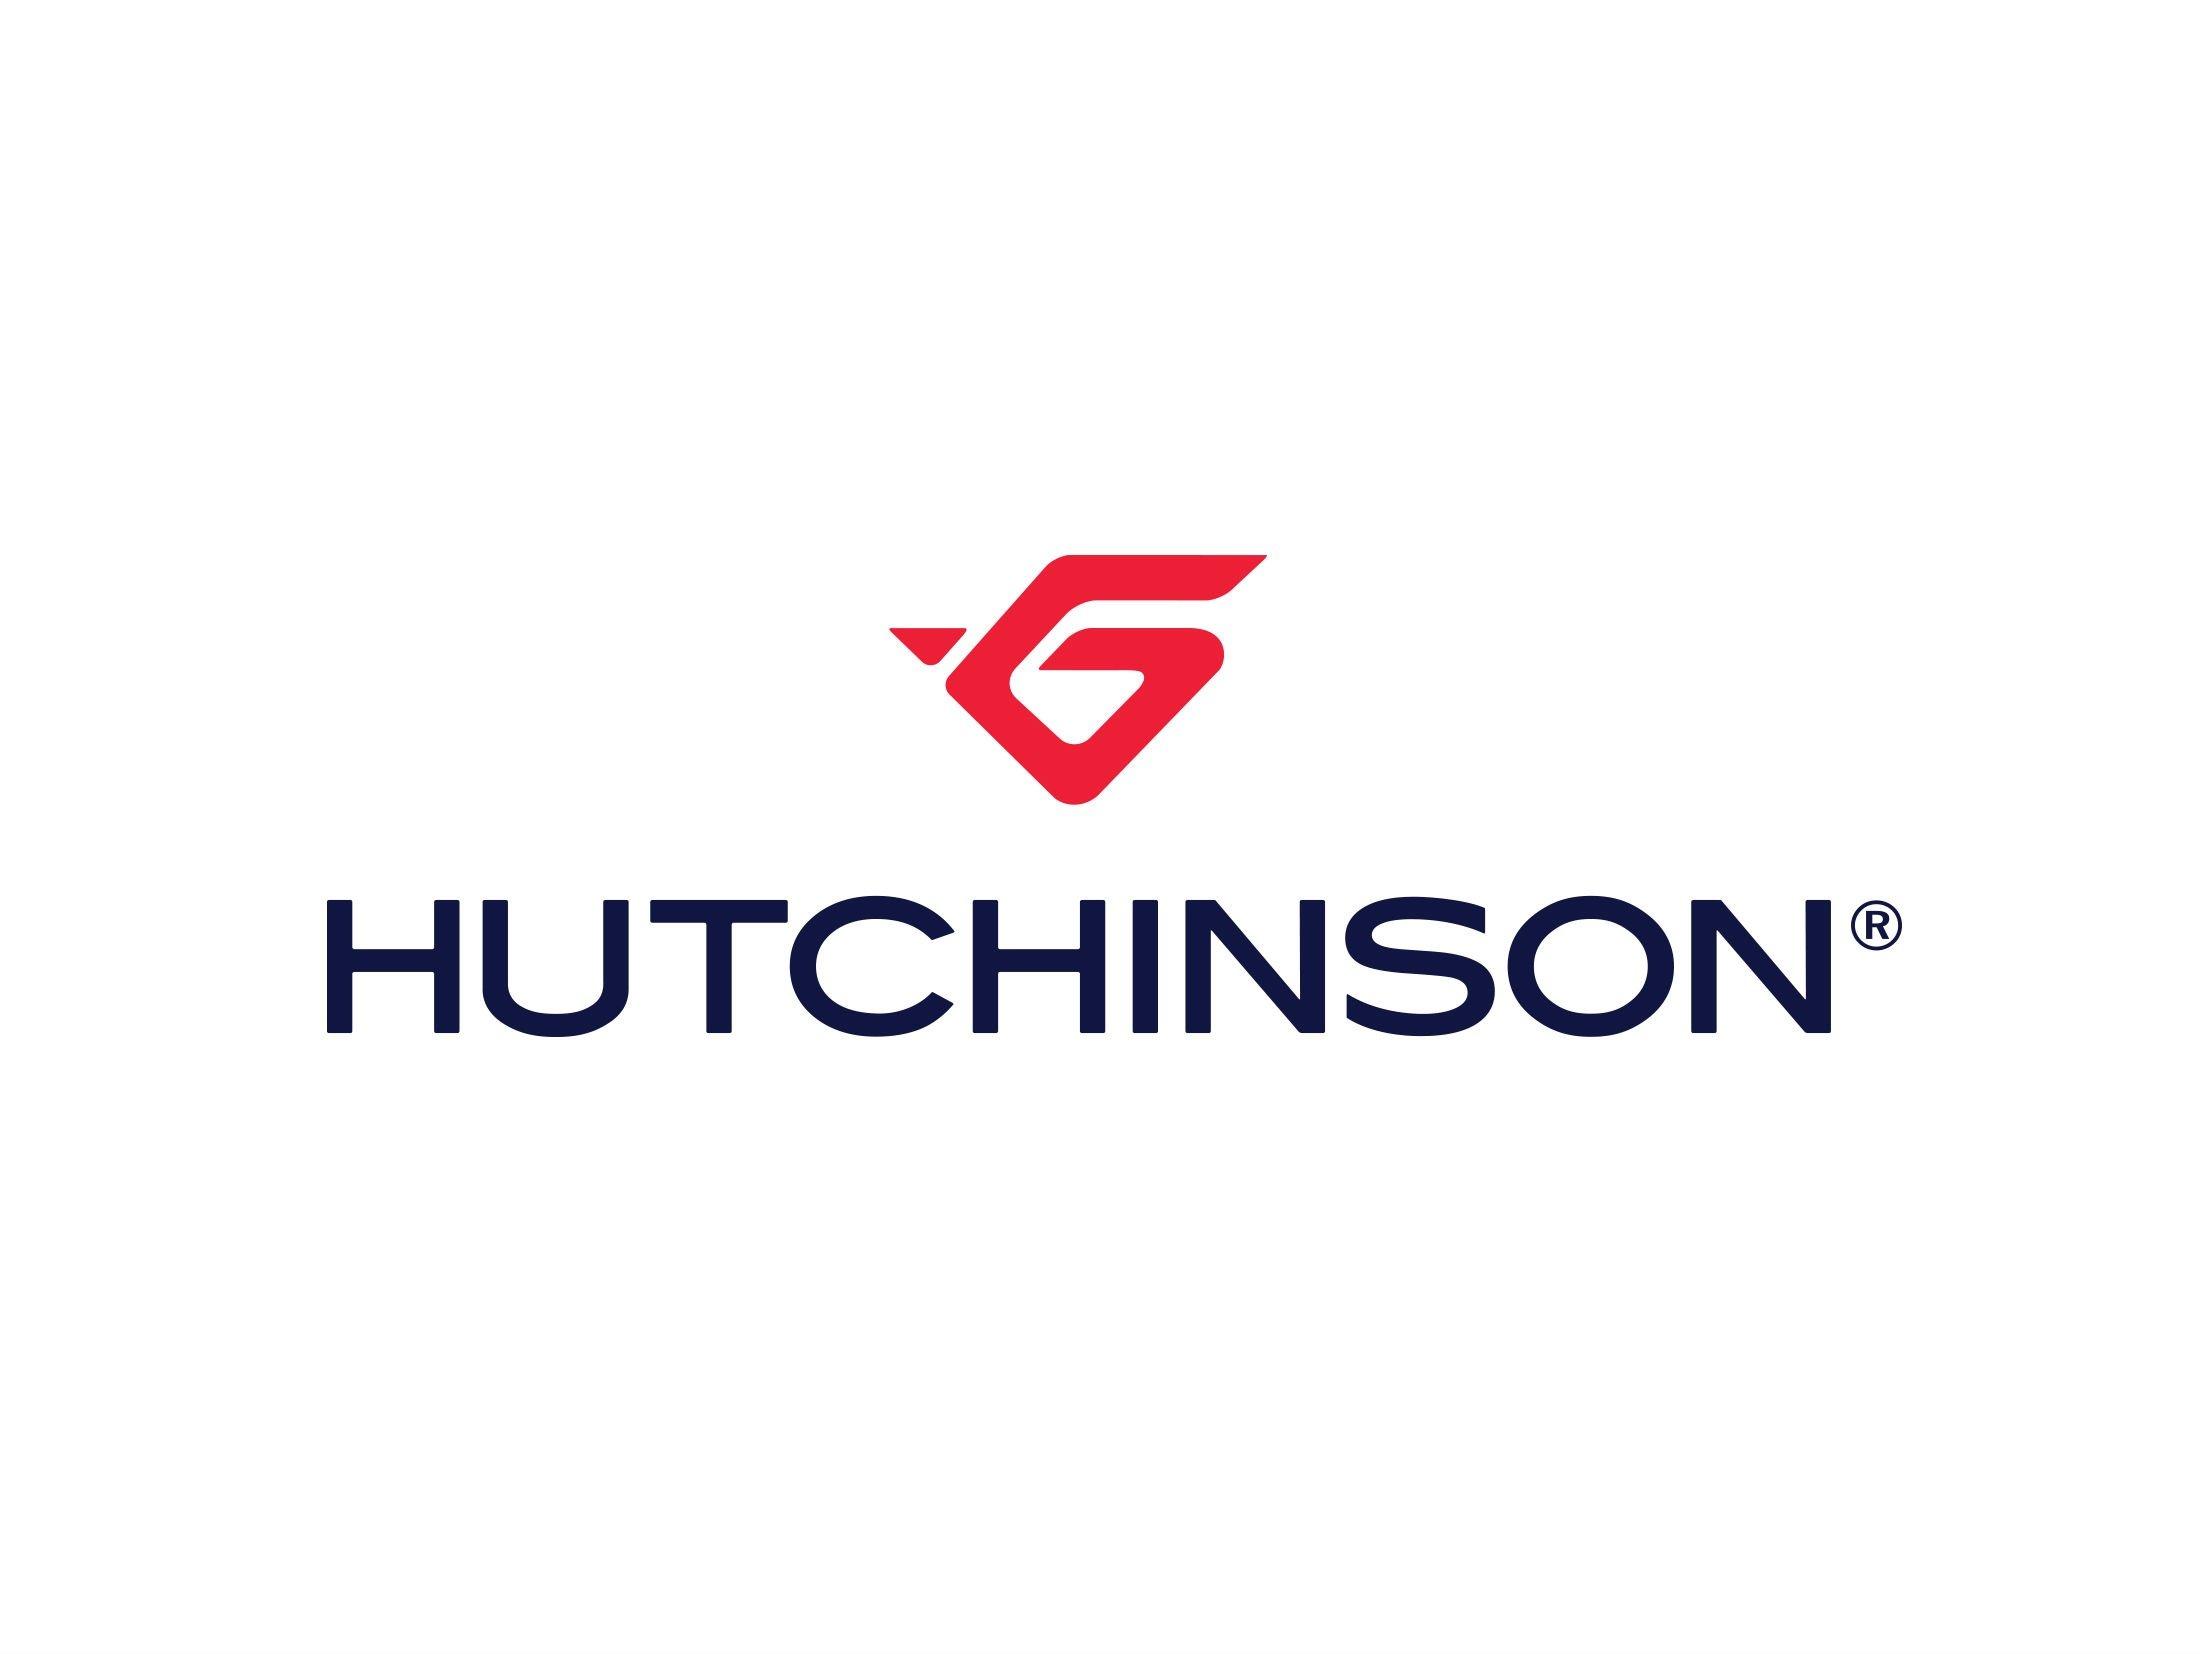 HUDCHINSON